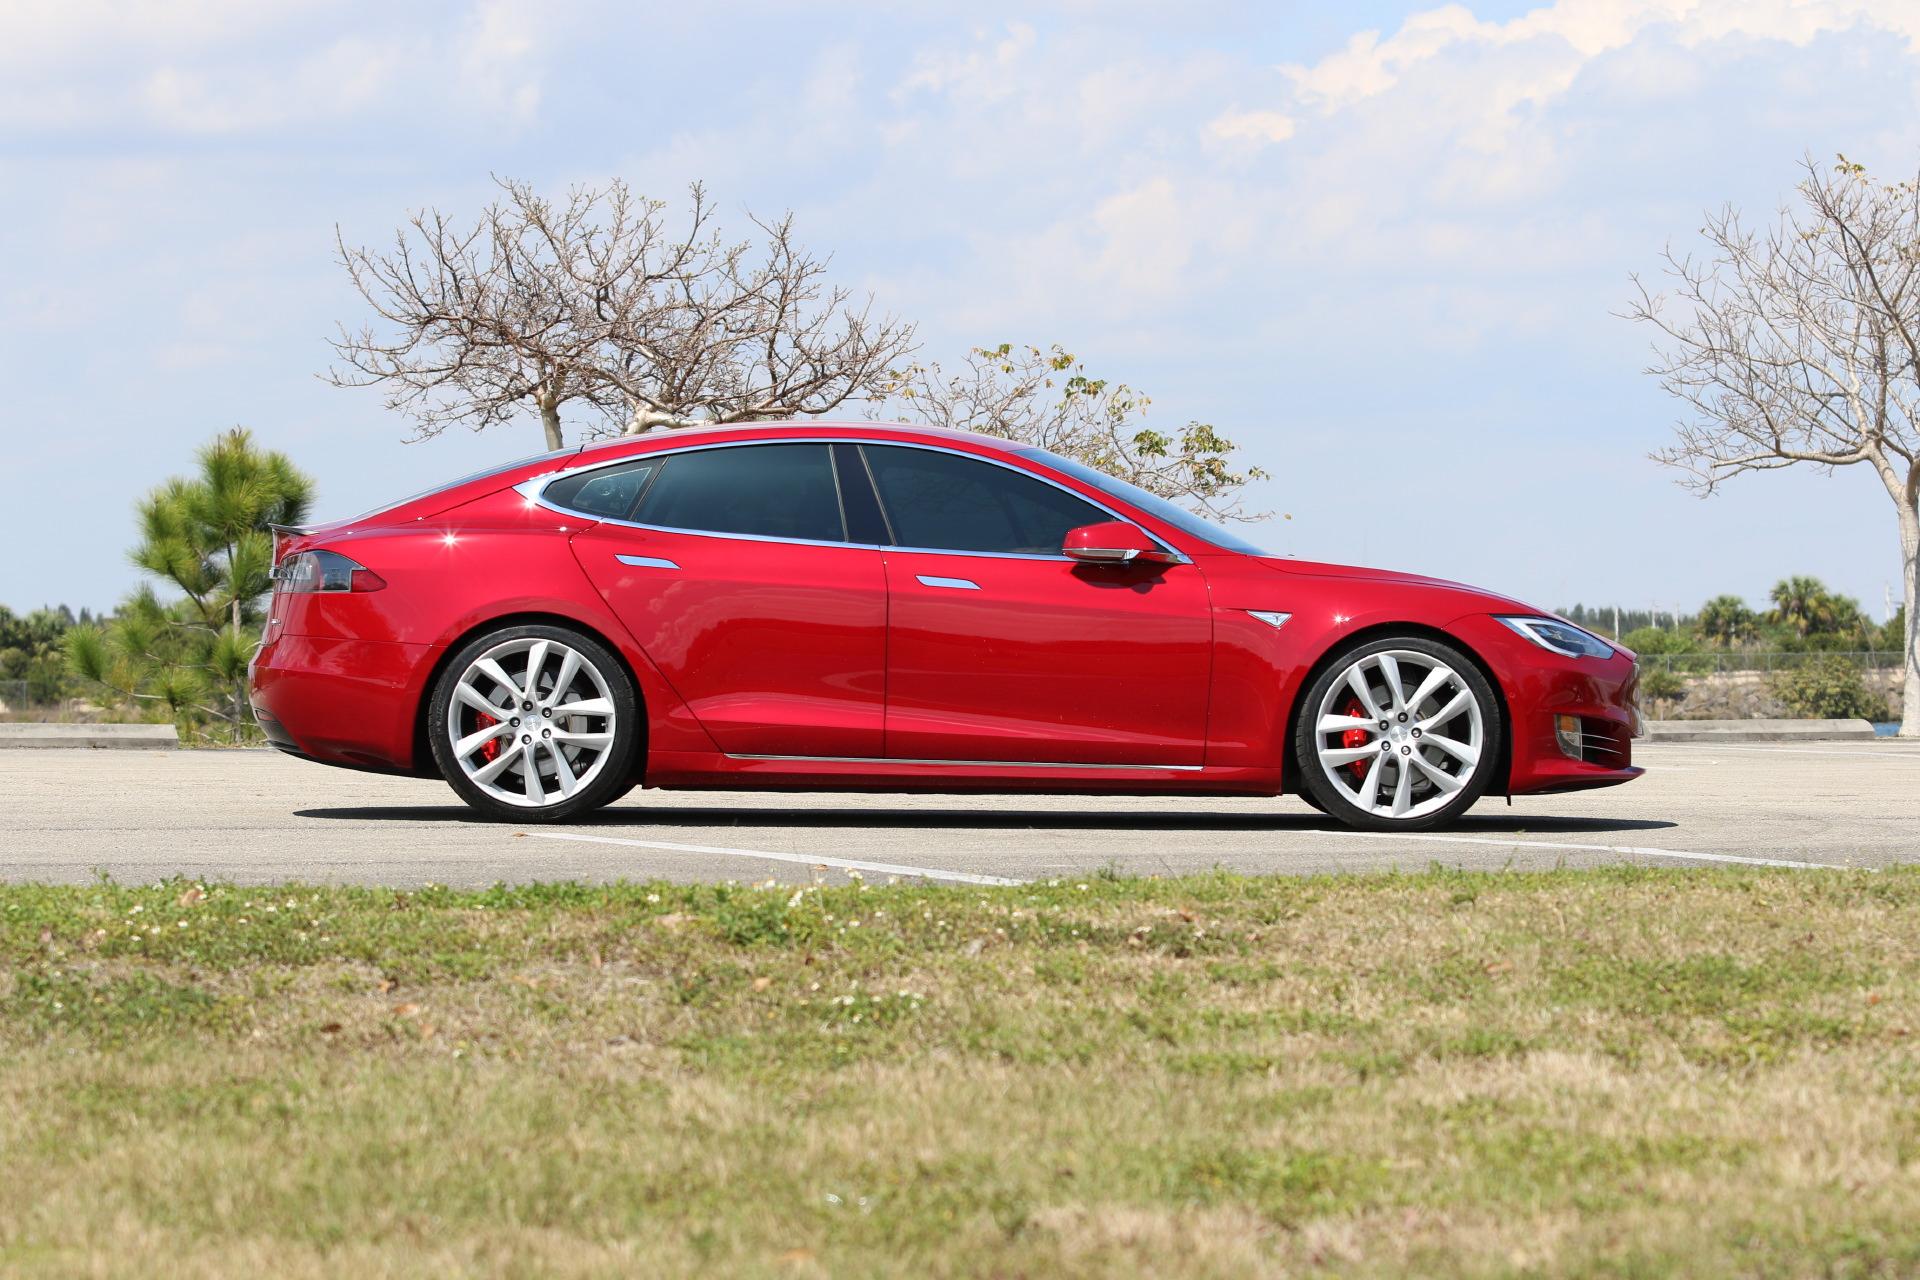 New Oem Tesla Forged Lightweight Arachnid Wheels On The